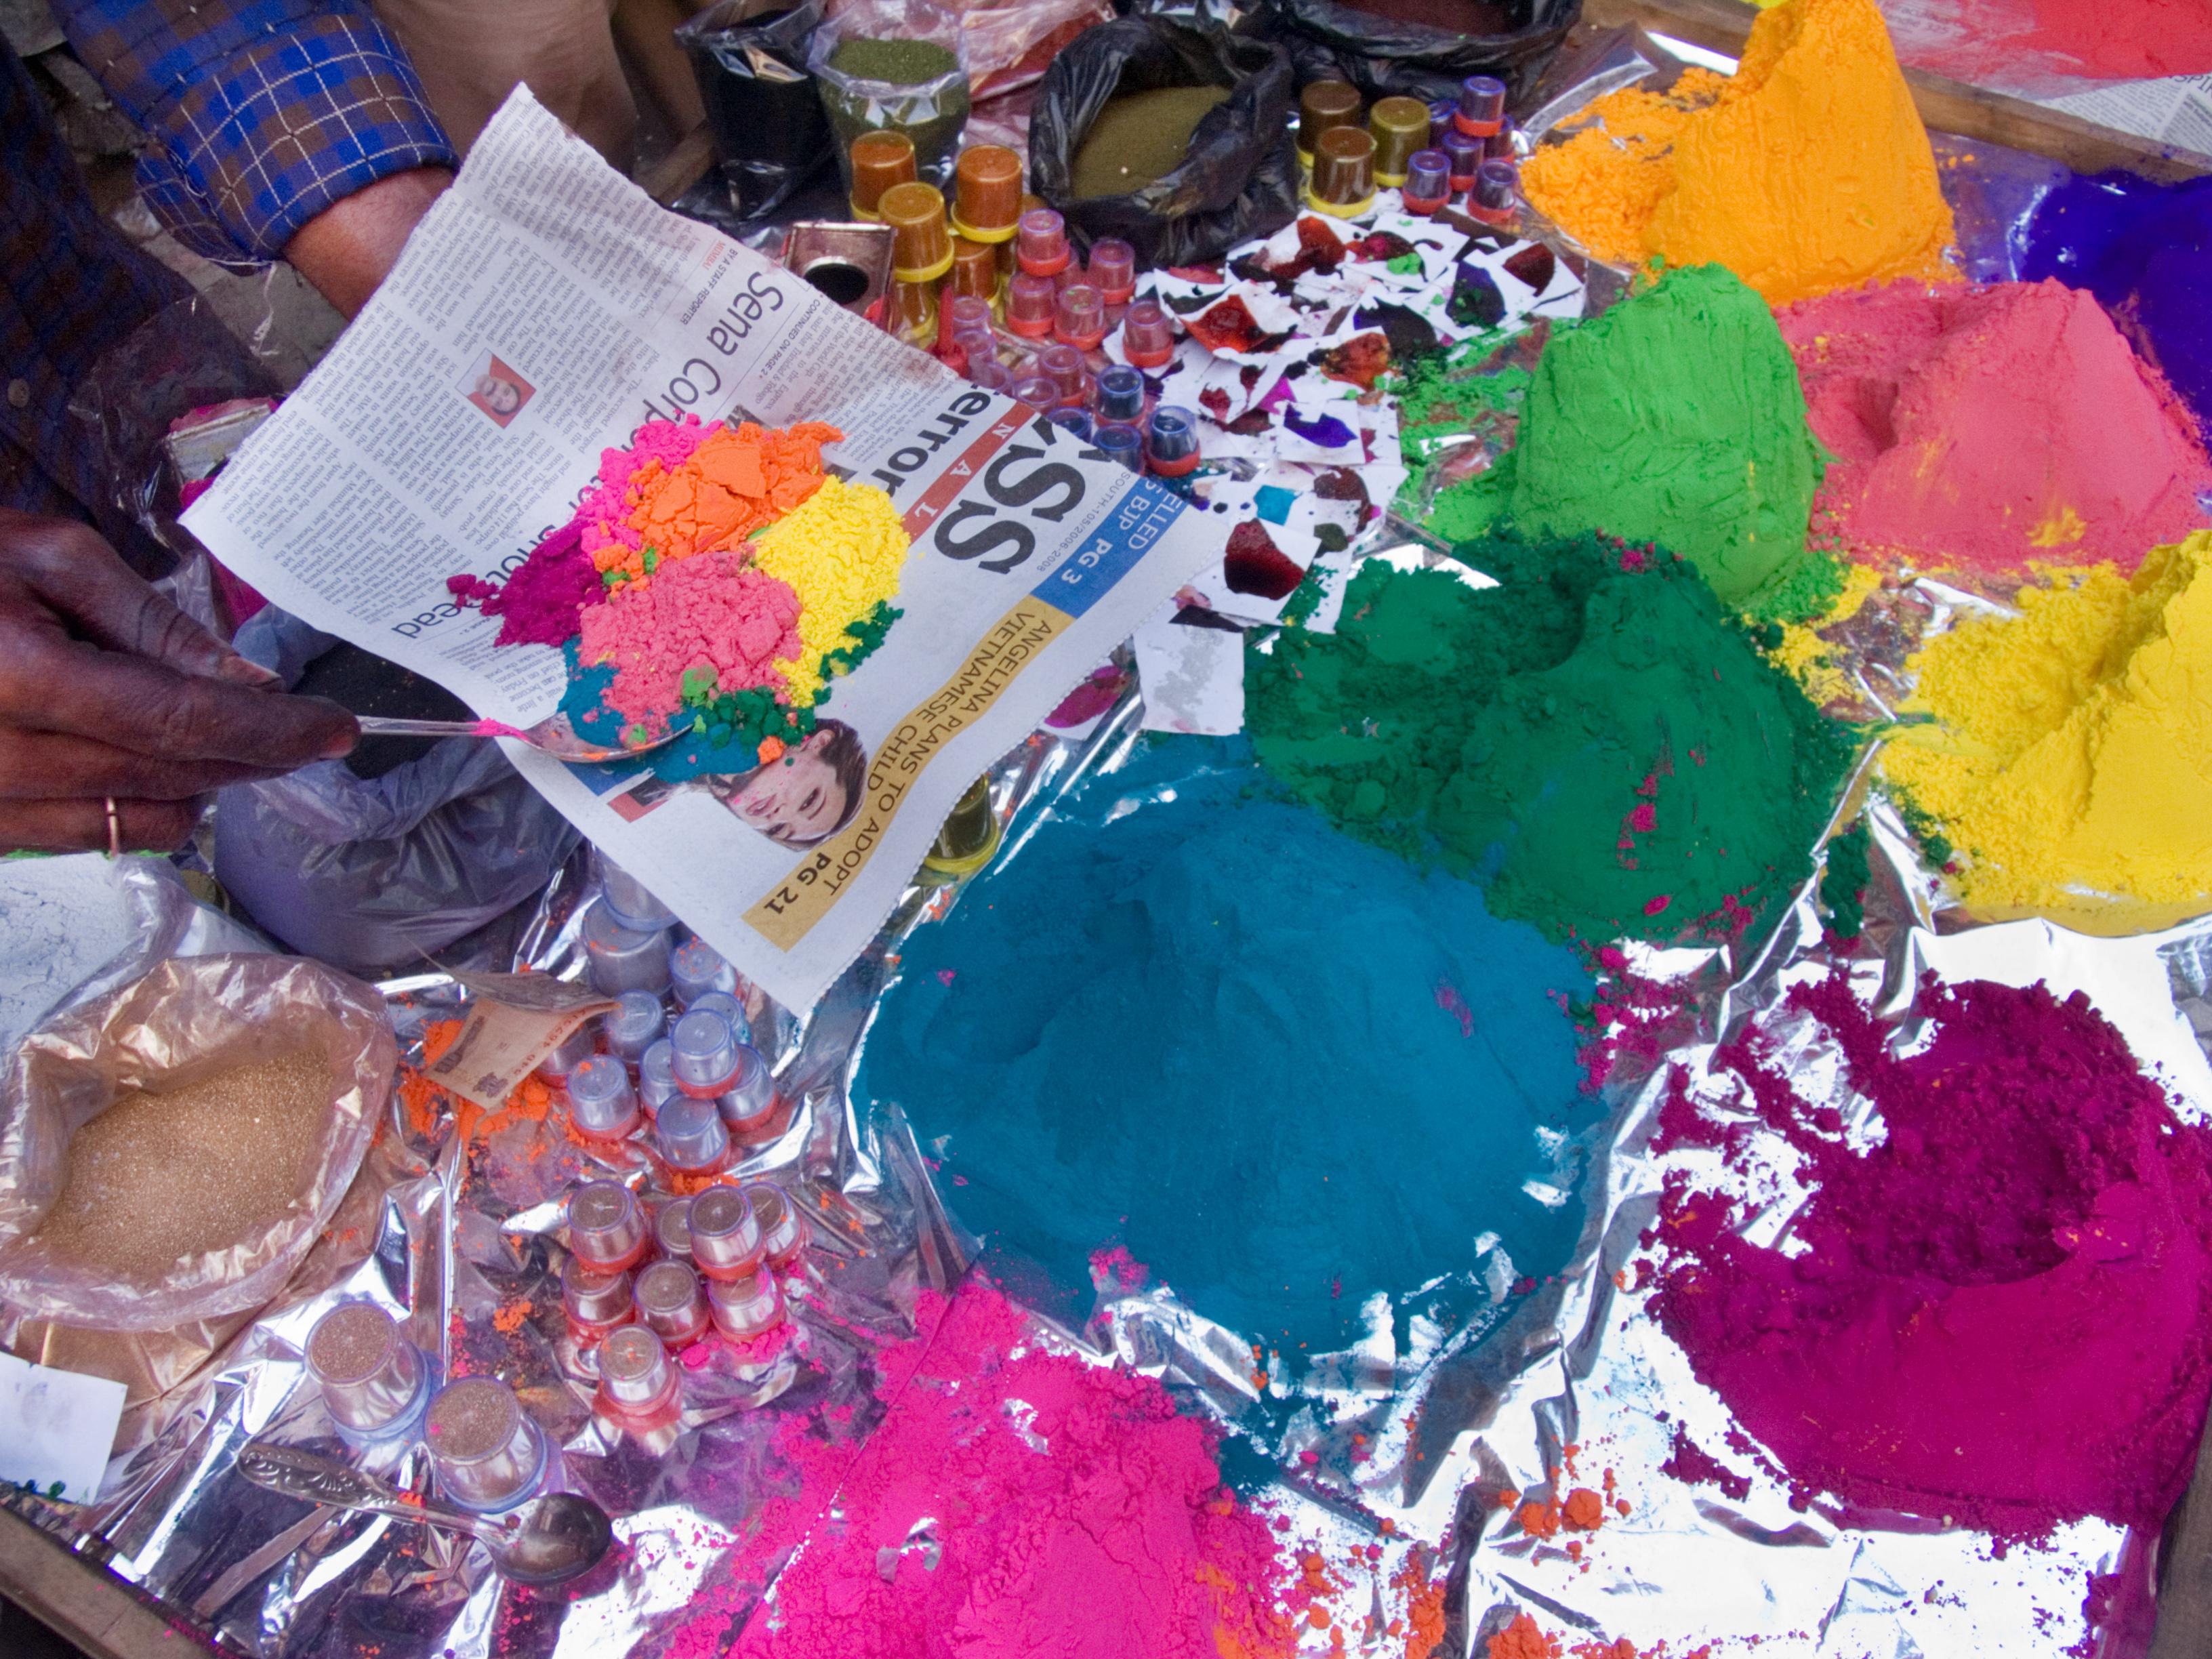 7266 portal athenahealth - File India Color Powder Stalls 7266 Jpg